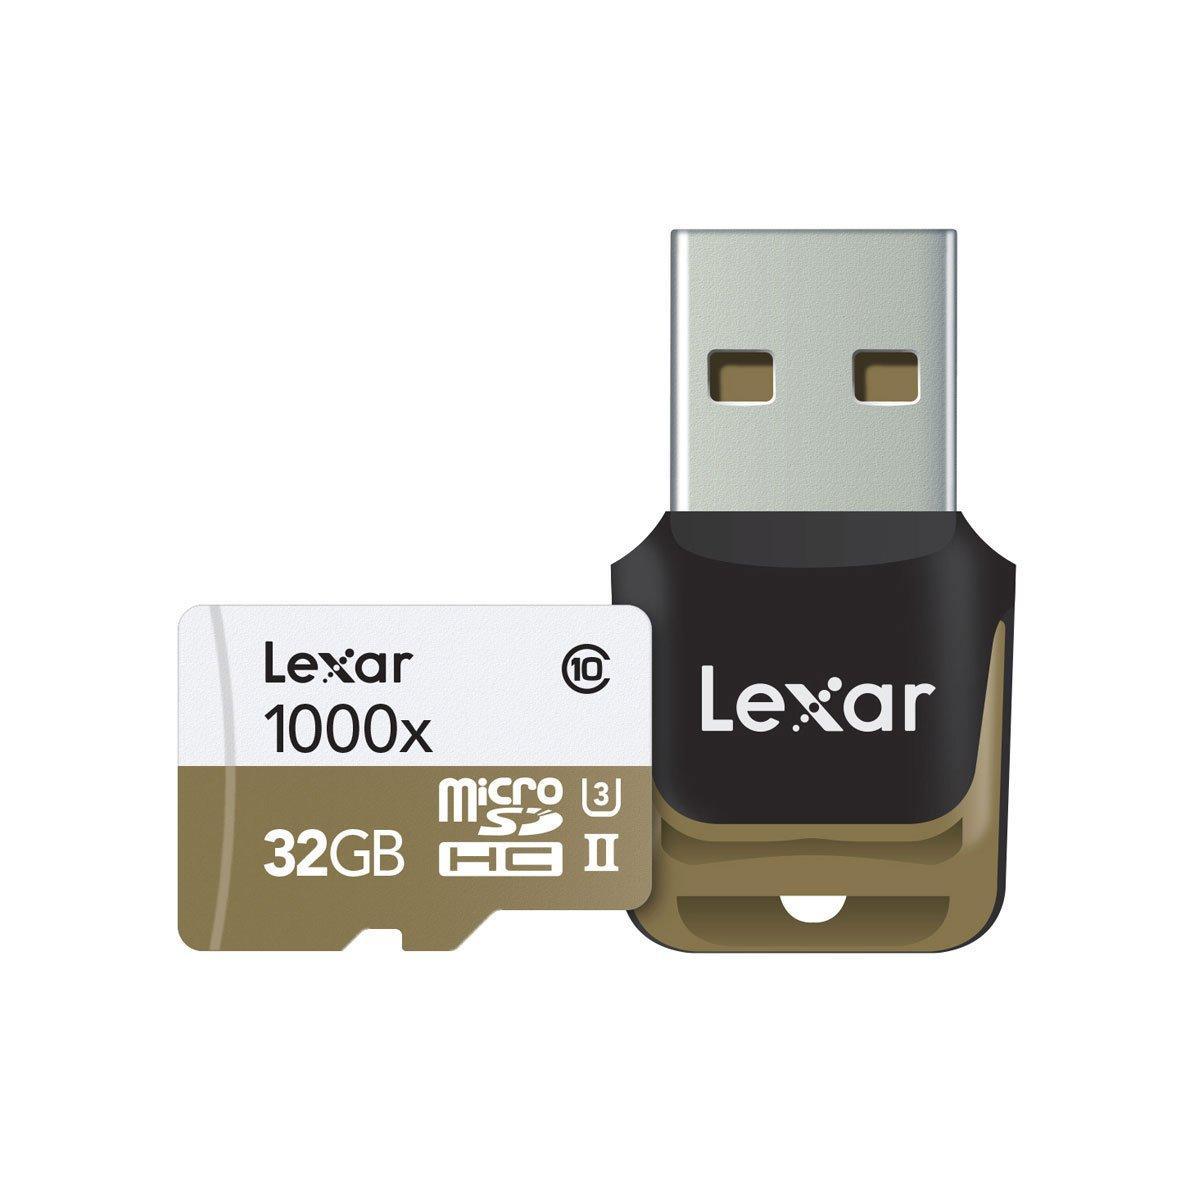 Lexar High-Performance MSDHC UHS-II 1000X 32GB